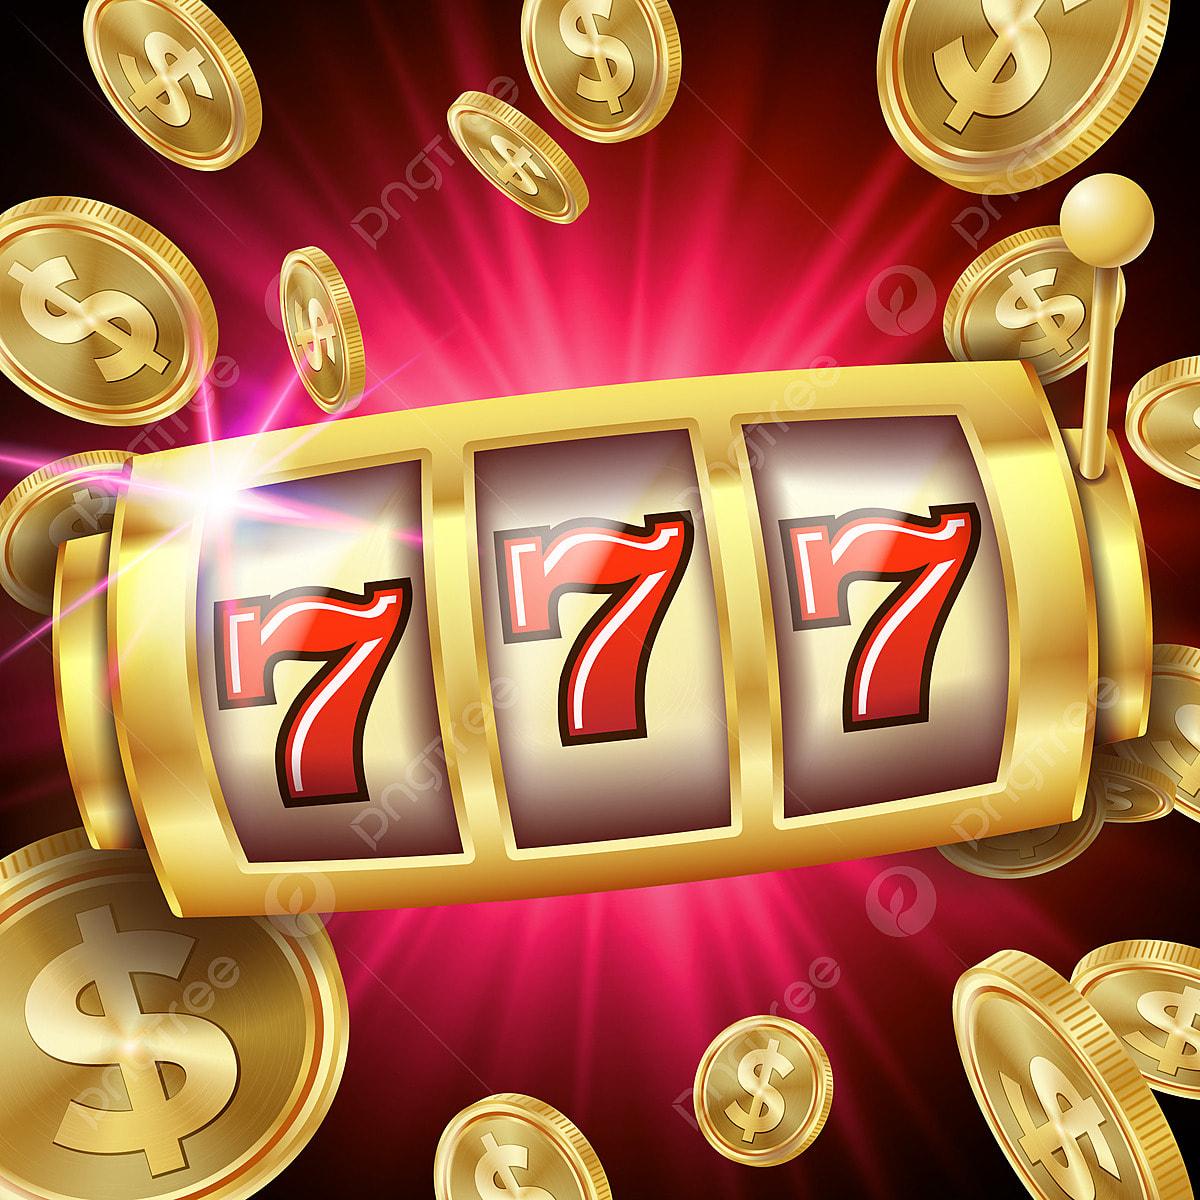 Best online casino sites